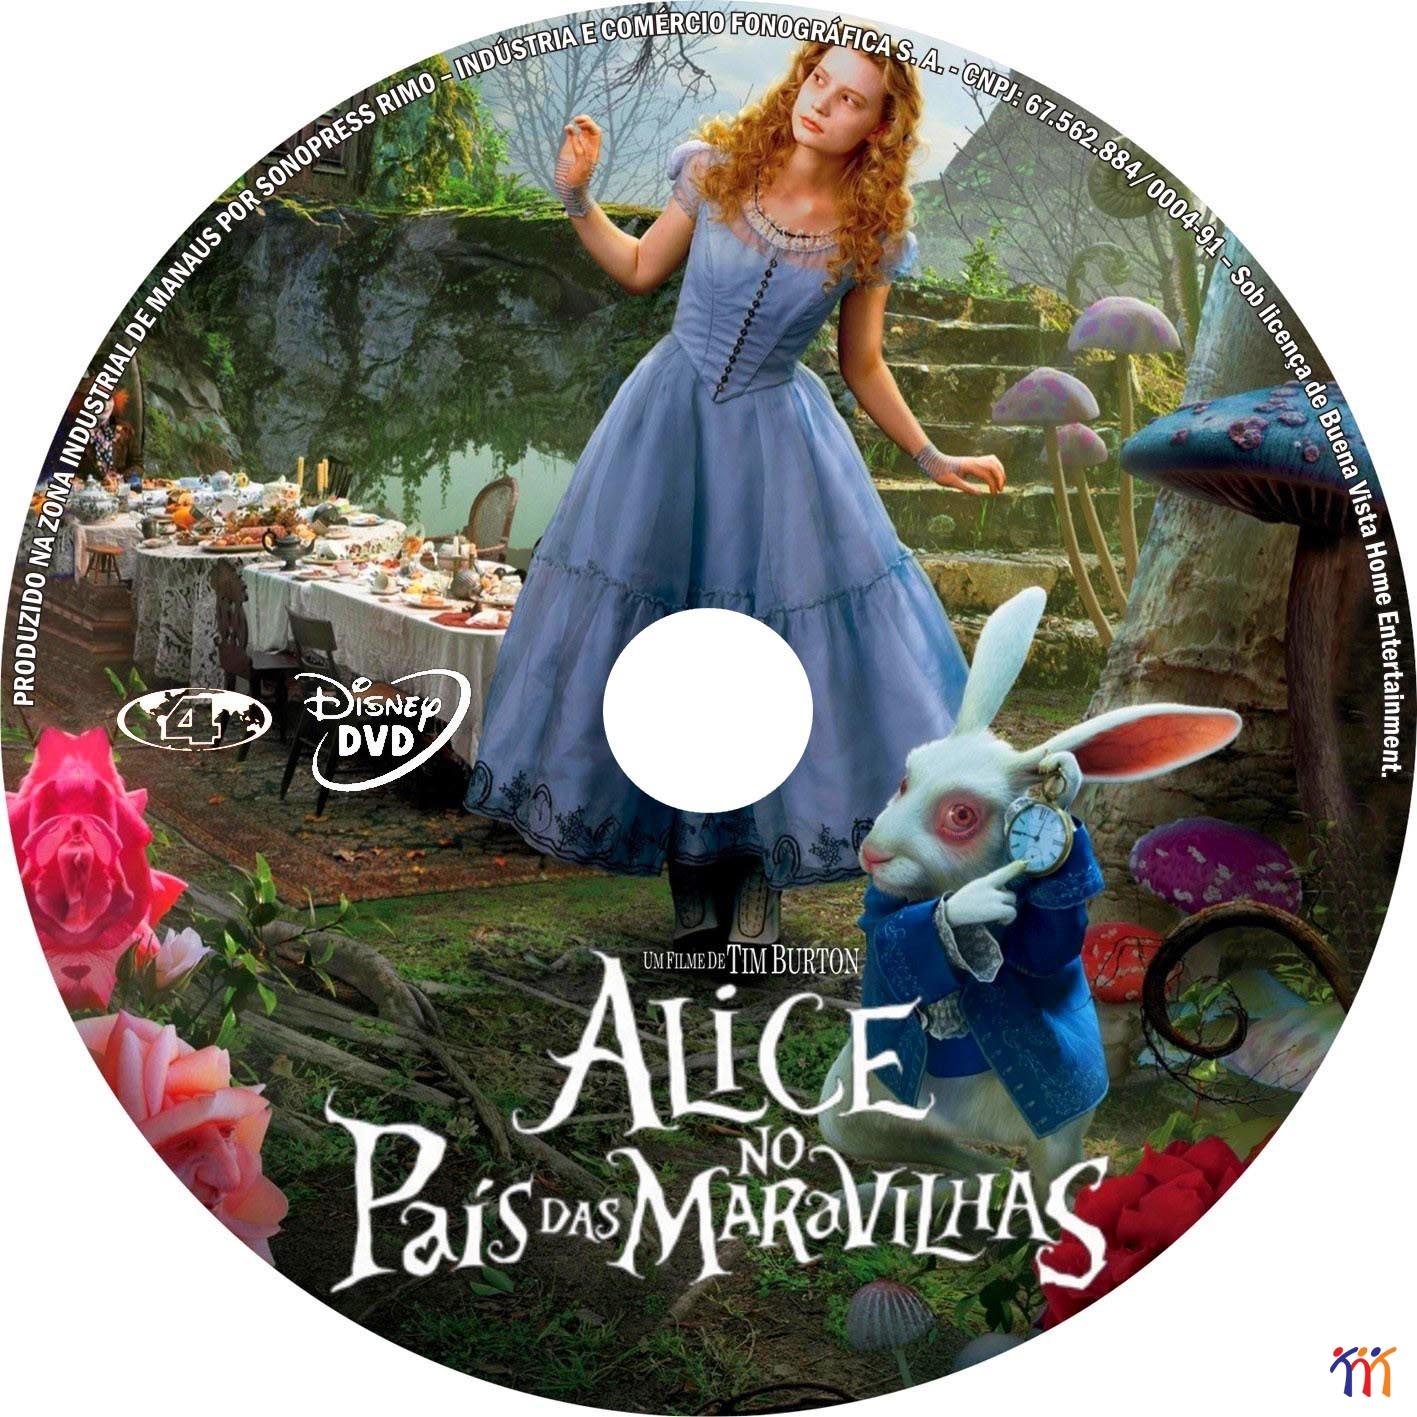 In nhãn đĩa, vỏ đĩa CD/ DVD